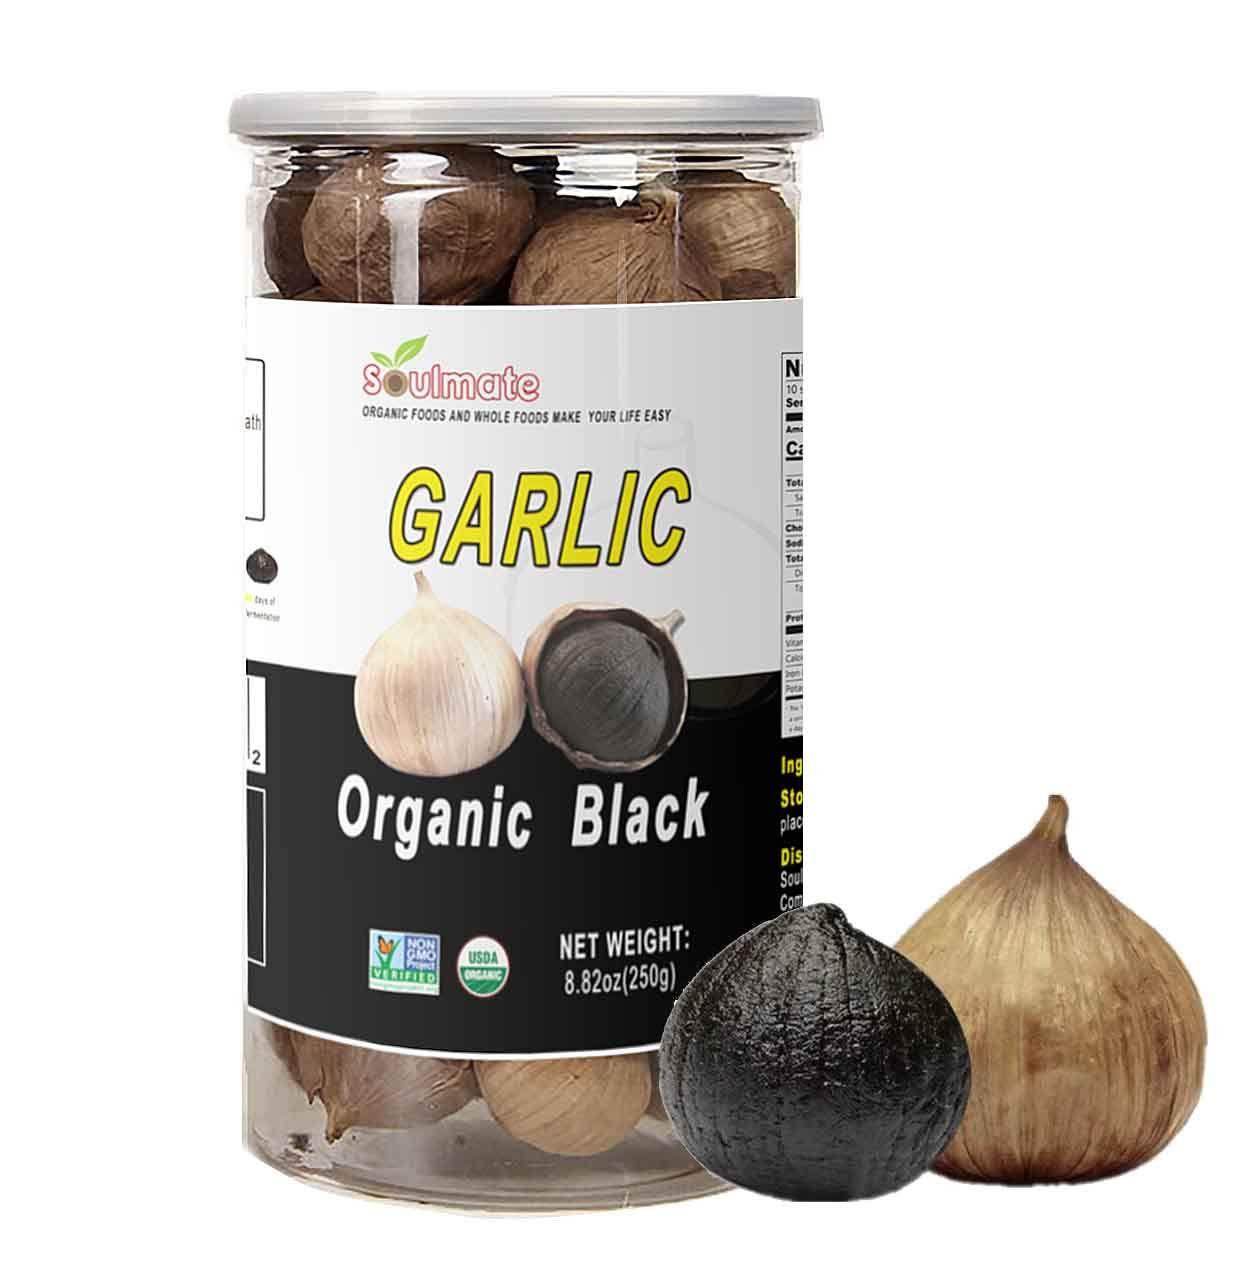 SOULMATE Organic Black Garlic 250g Organic Whole Garlic Fermented 90 Days, NON-GMO Made in California, High in Antioxidants One-Clove Organic Black Garlic 8.82 Ounce (250g)